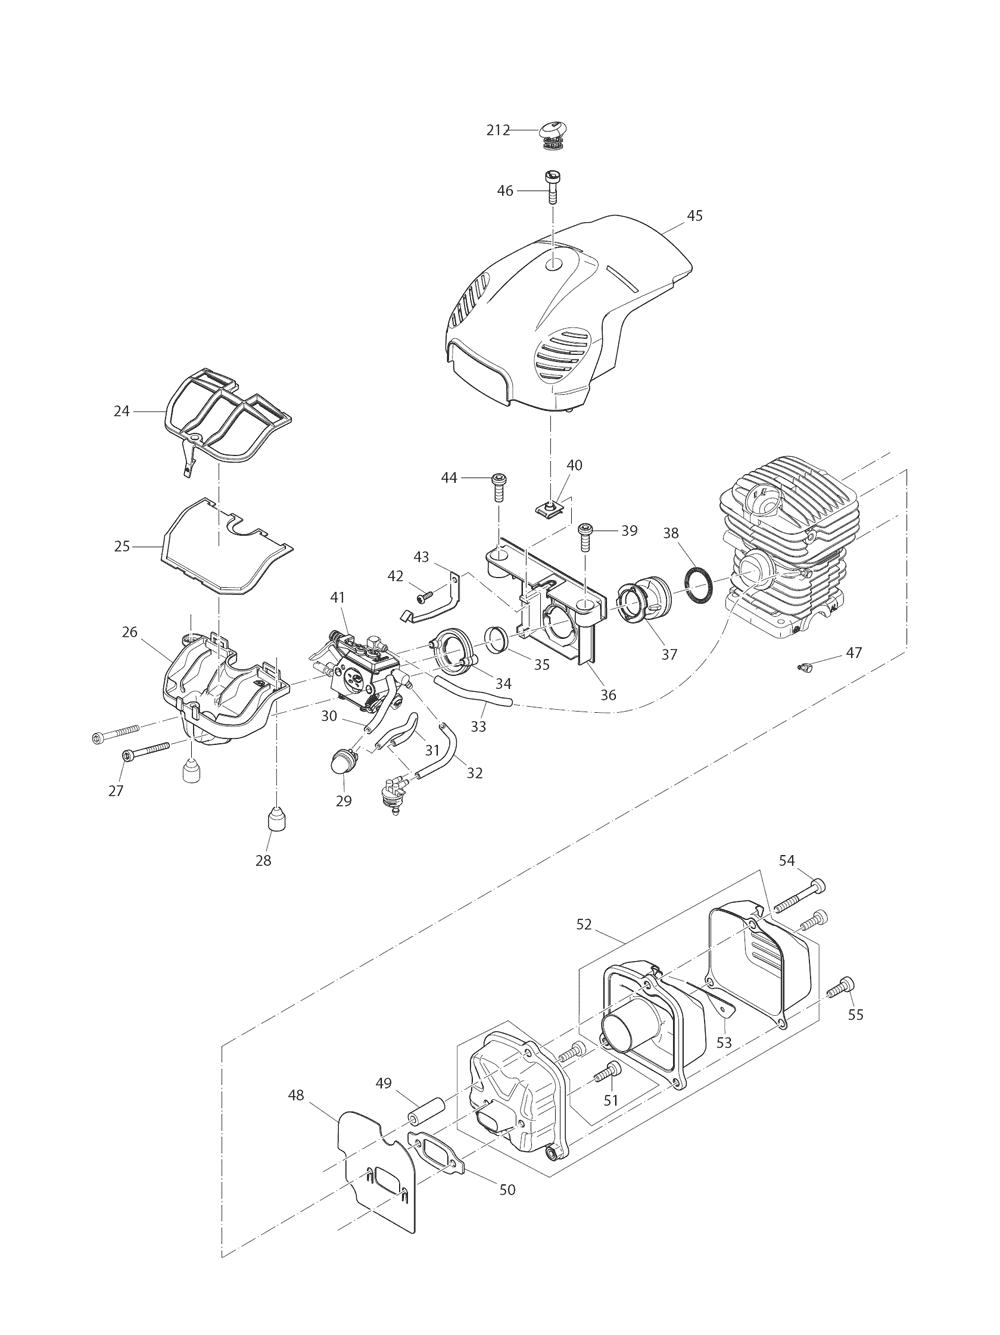 EA3201S40B-T4-Makita-PB-1Break Down